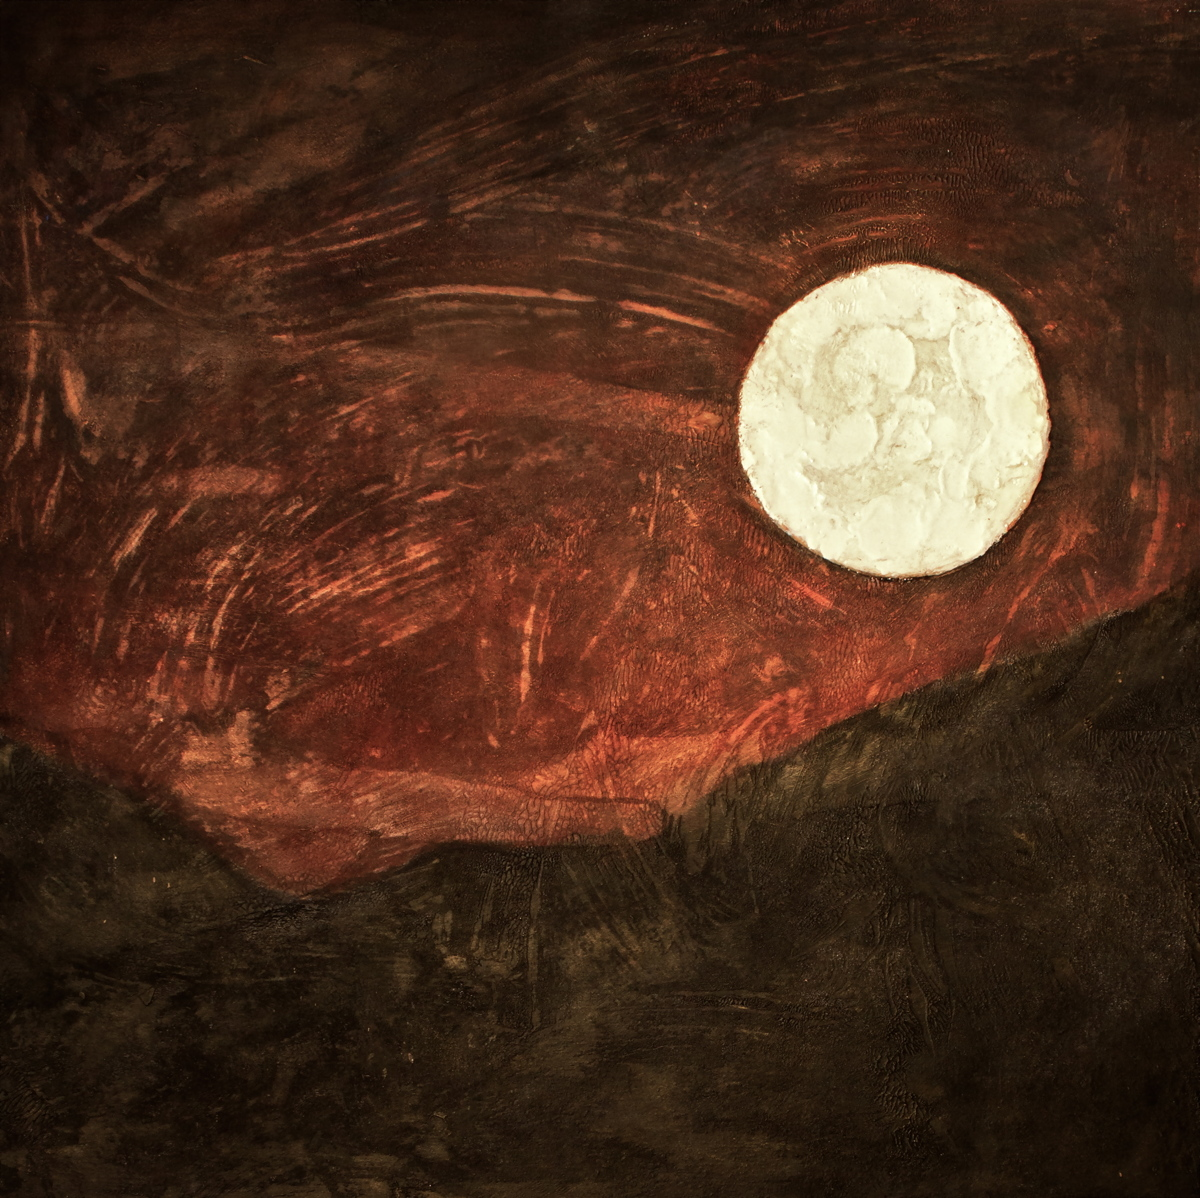 Taos Moon (large view)